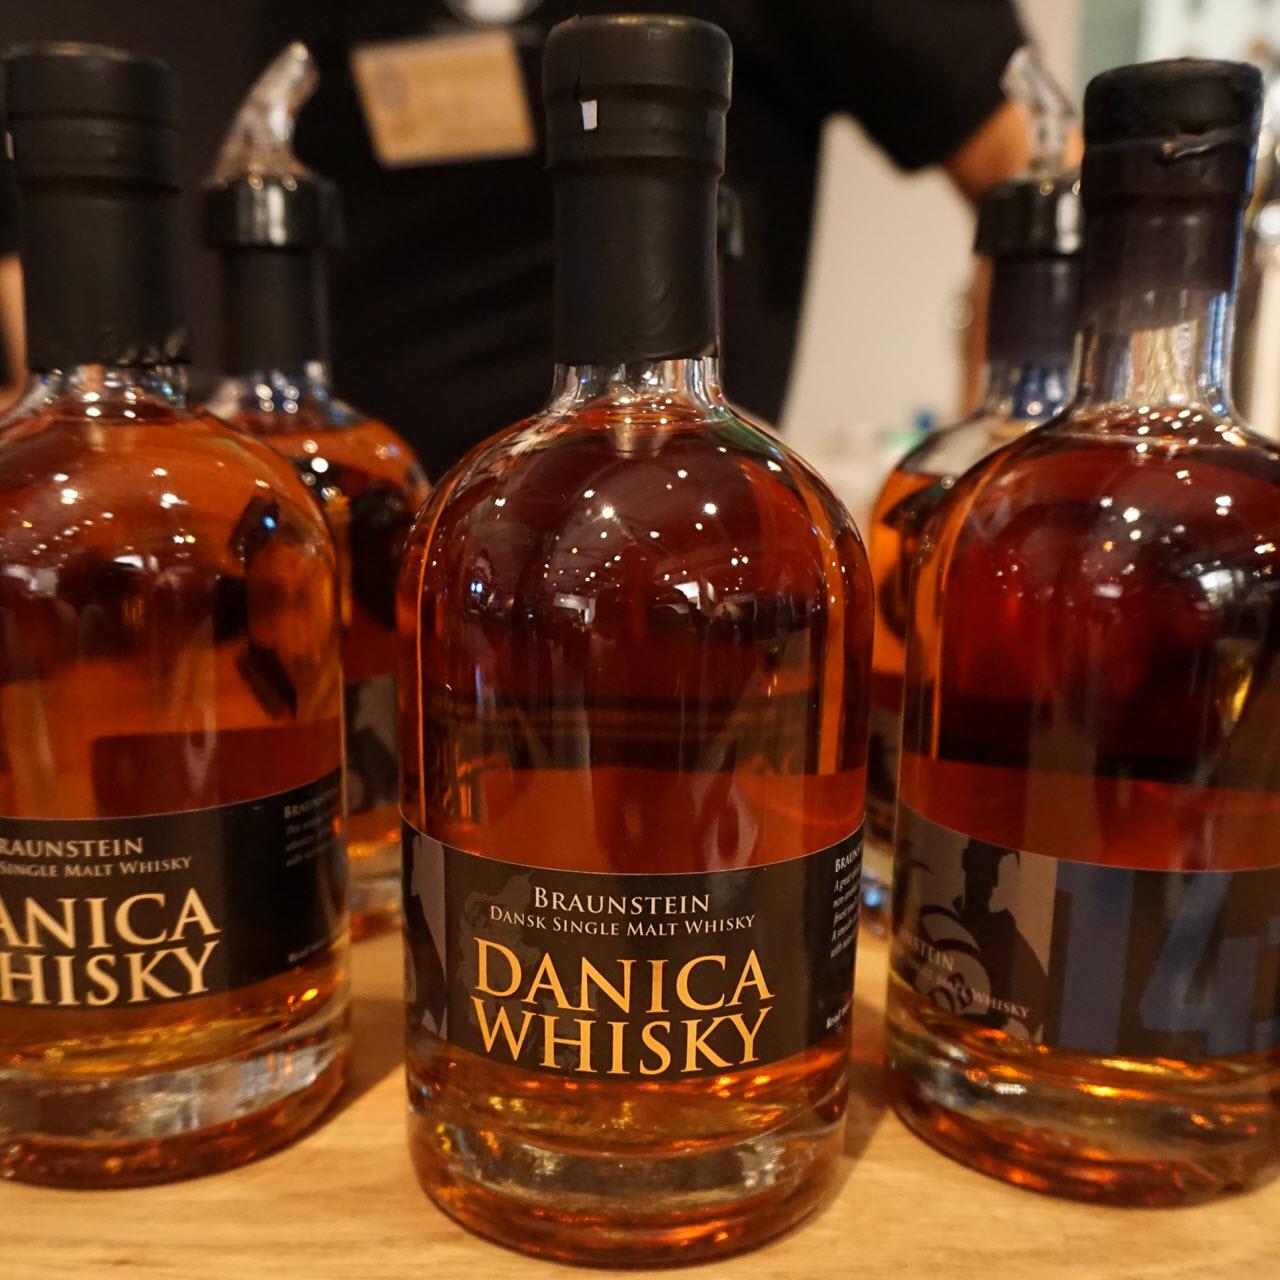 braunstein_danica_whisky.jpg